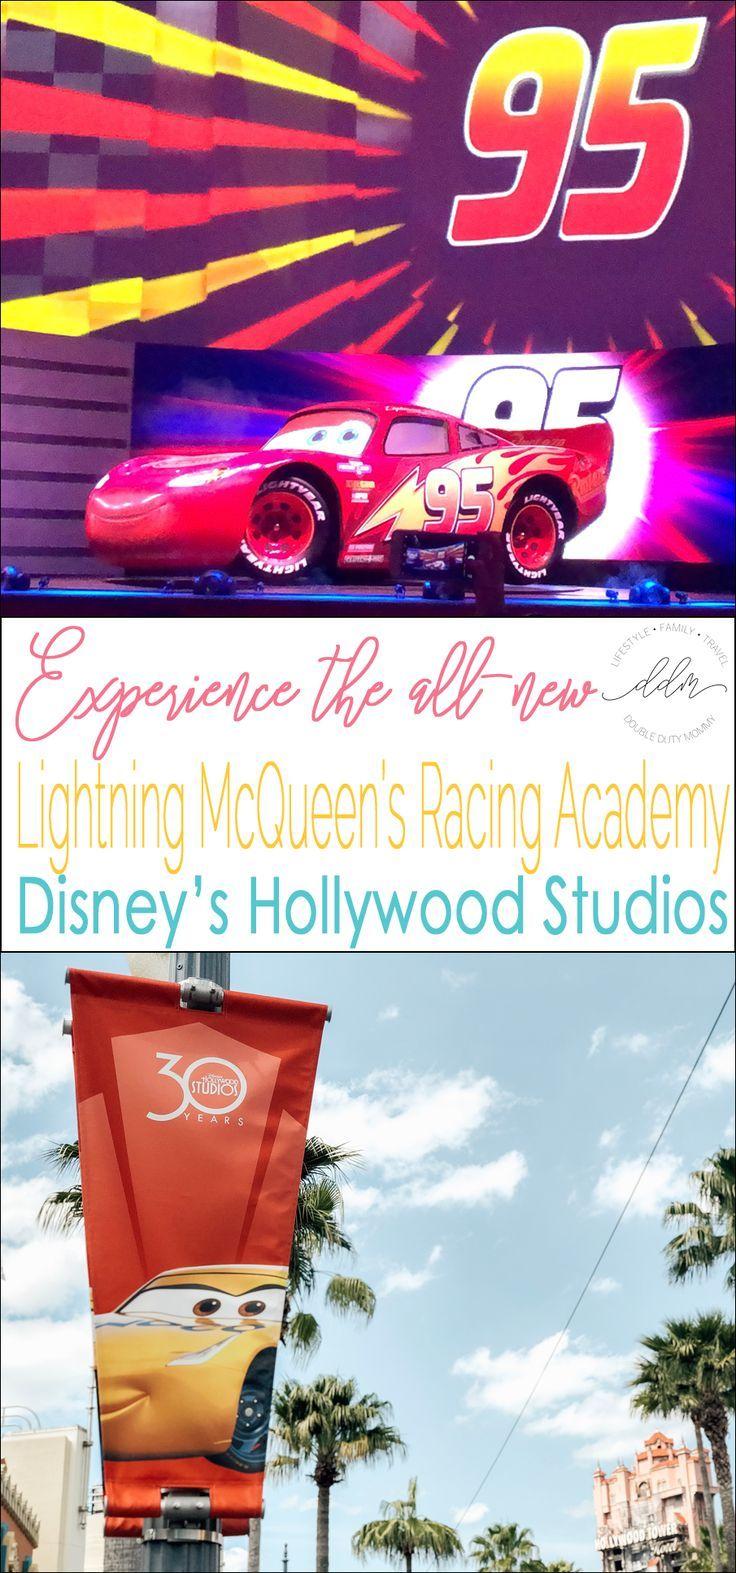 Lightning Mcqueen S Racing Academy Disney S Hollywood Studios Hollywood Studios Disney Disney World Tips And Tricks Disney Trip Planning